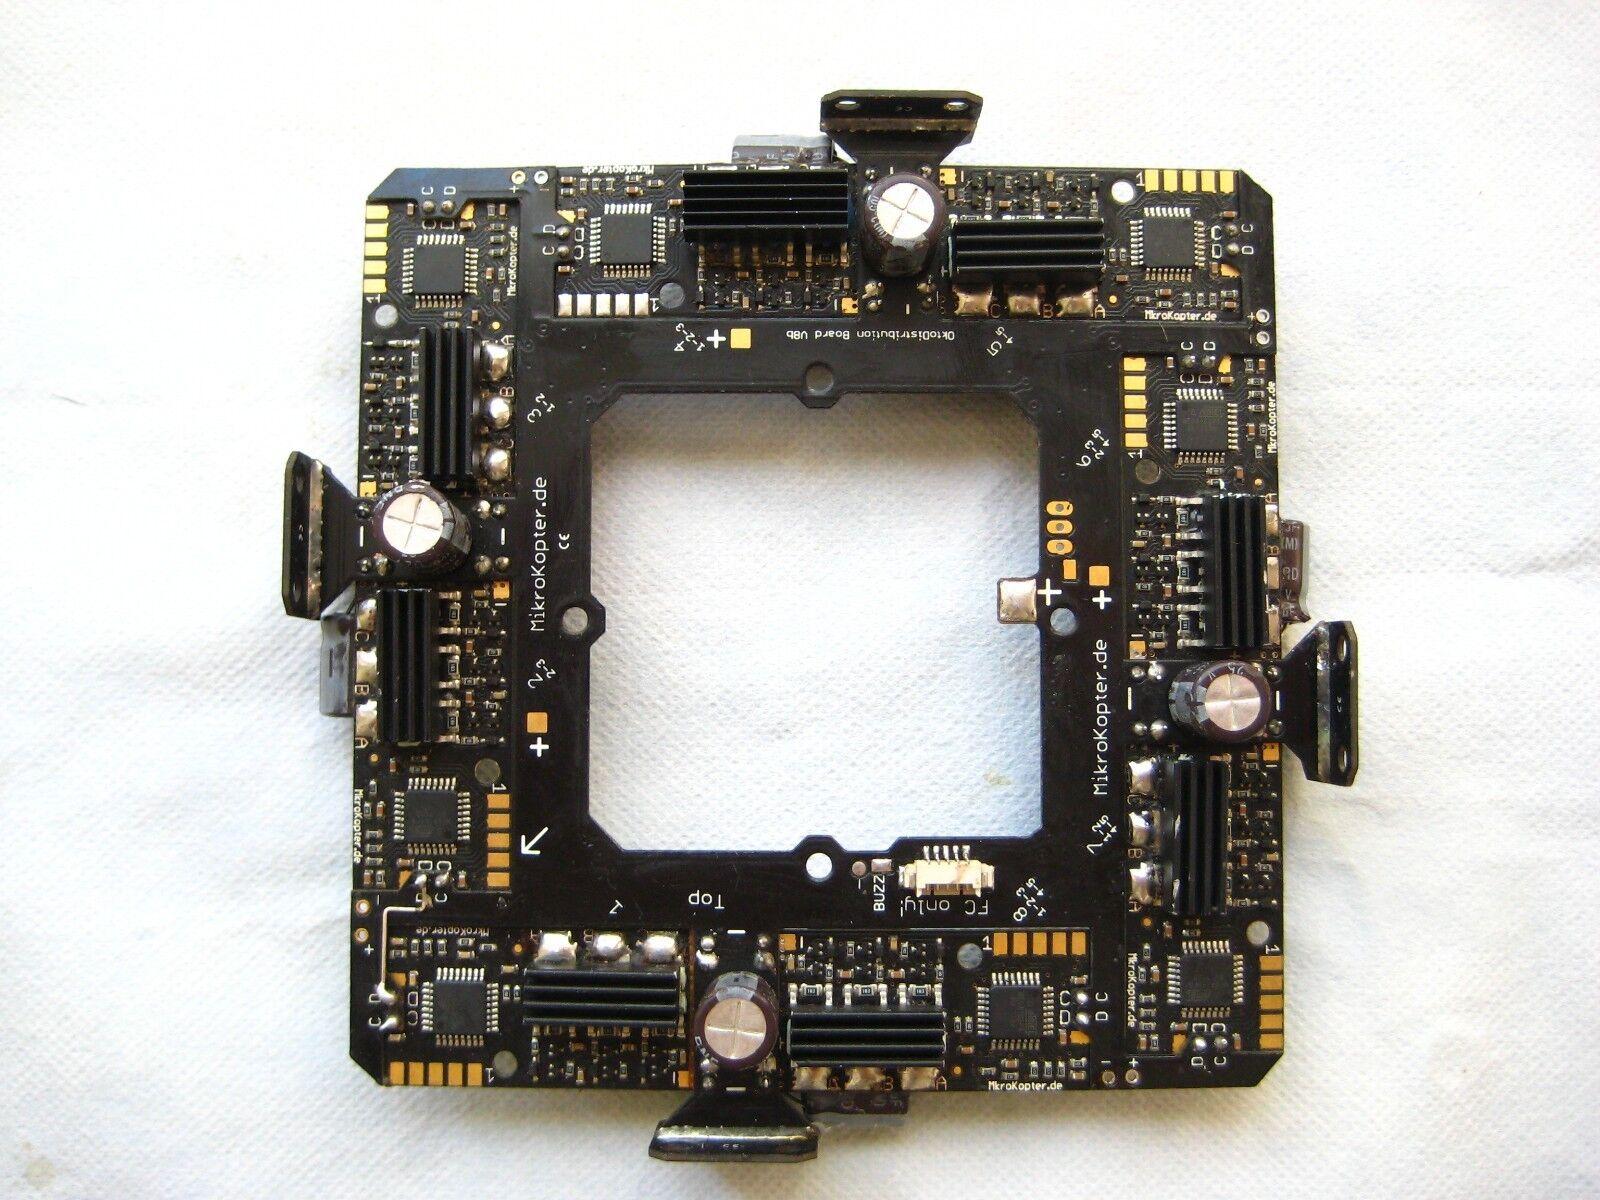 Mikrokopter Octo XL Tarjeta de distribución de alimentación, versión actualizada, probado 100%